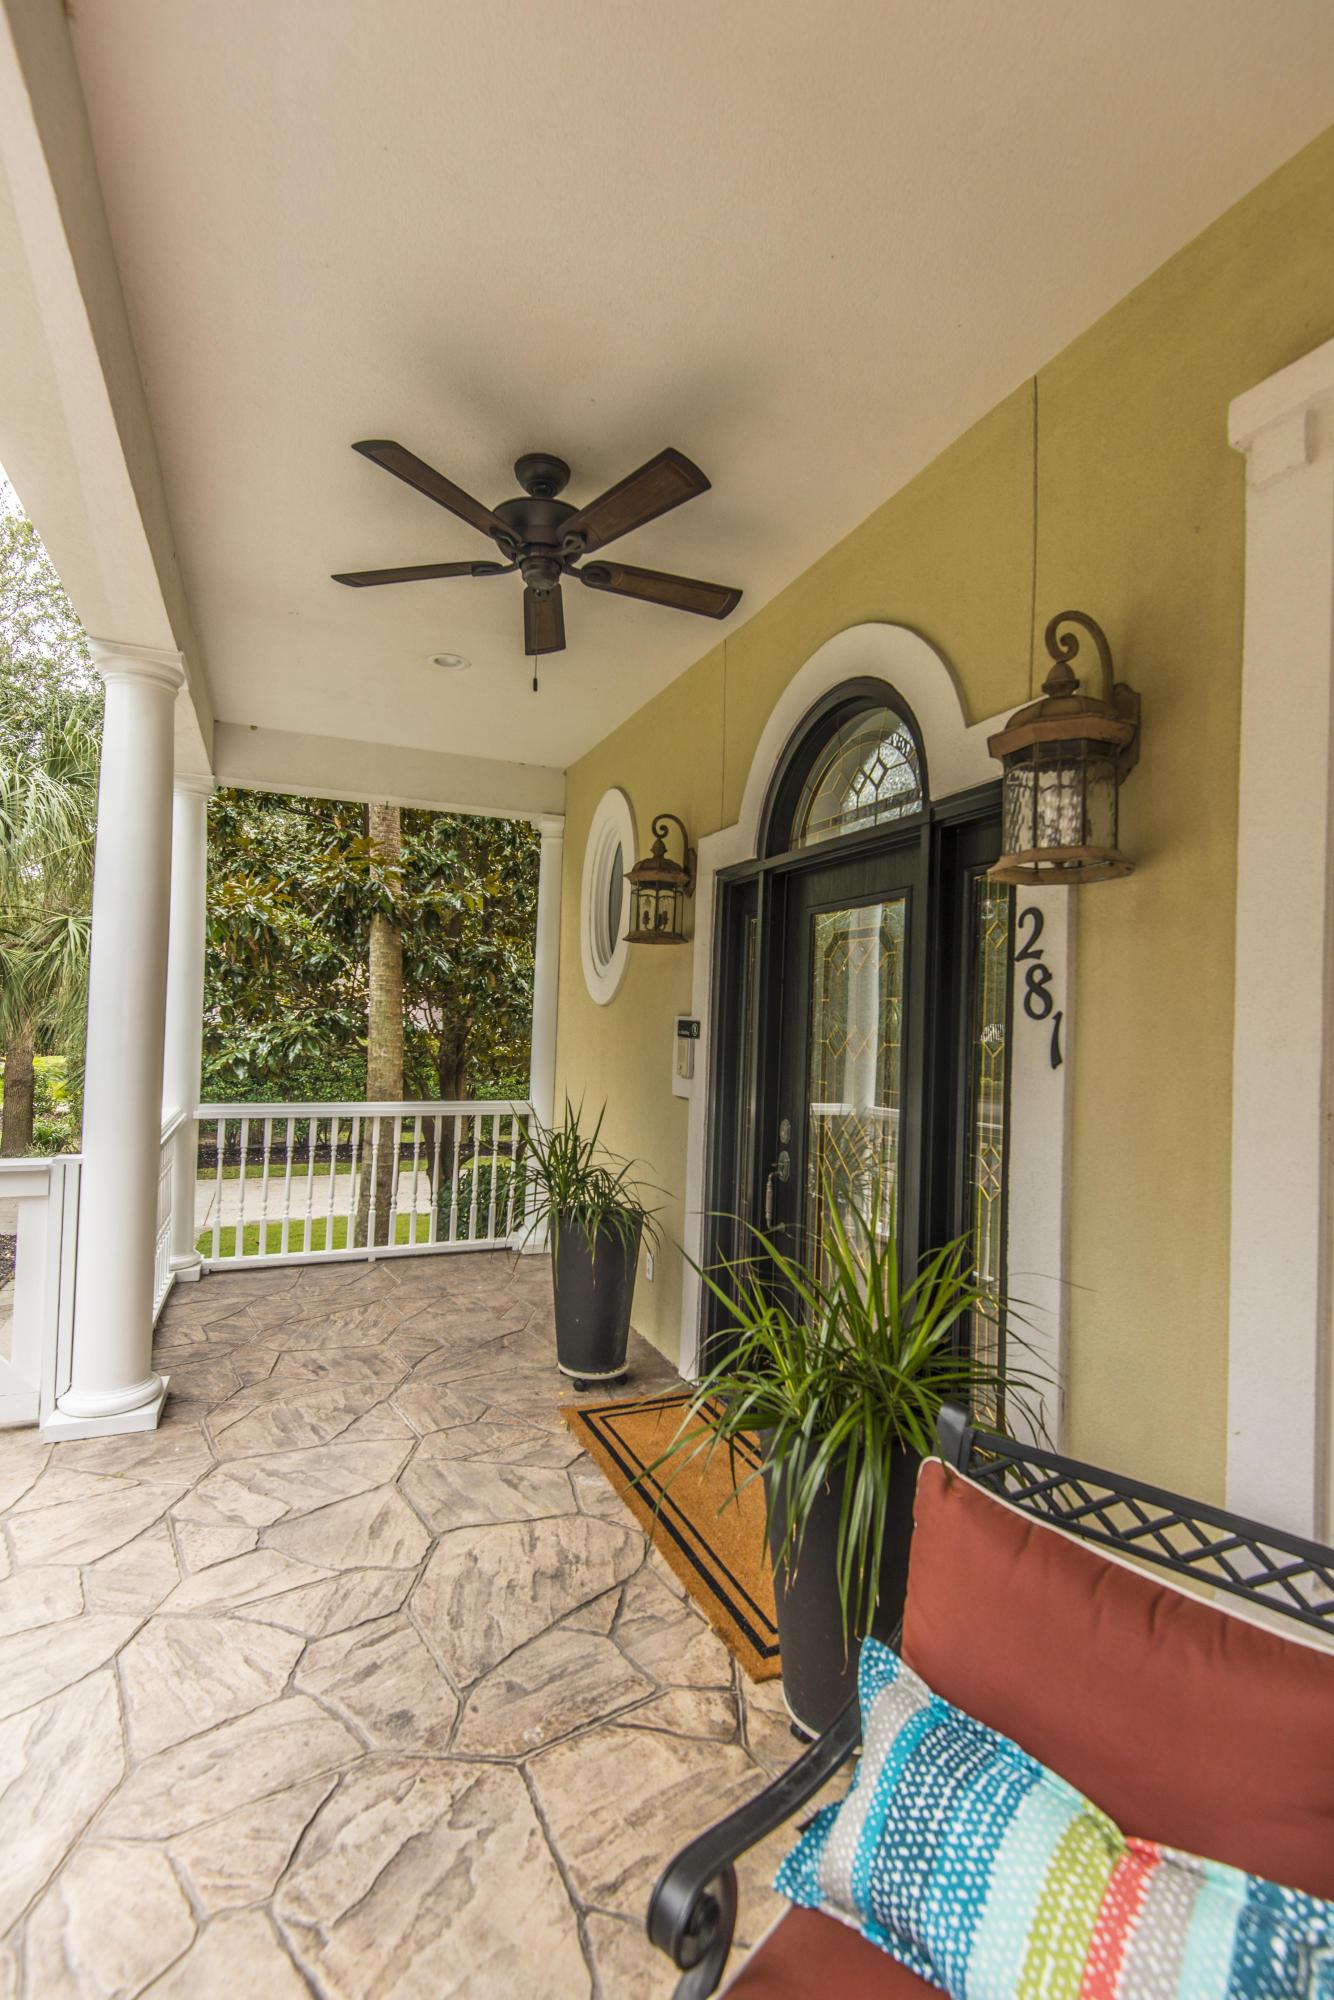 Back Bay Village Homes For Sale - 281 Indigo Bay, Mount Pleasant, SC - 16